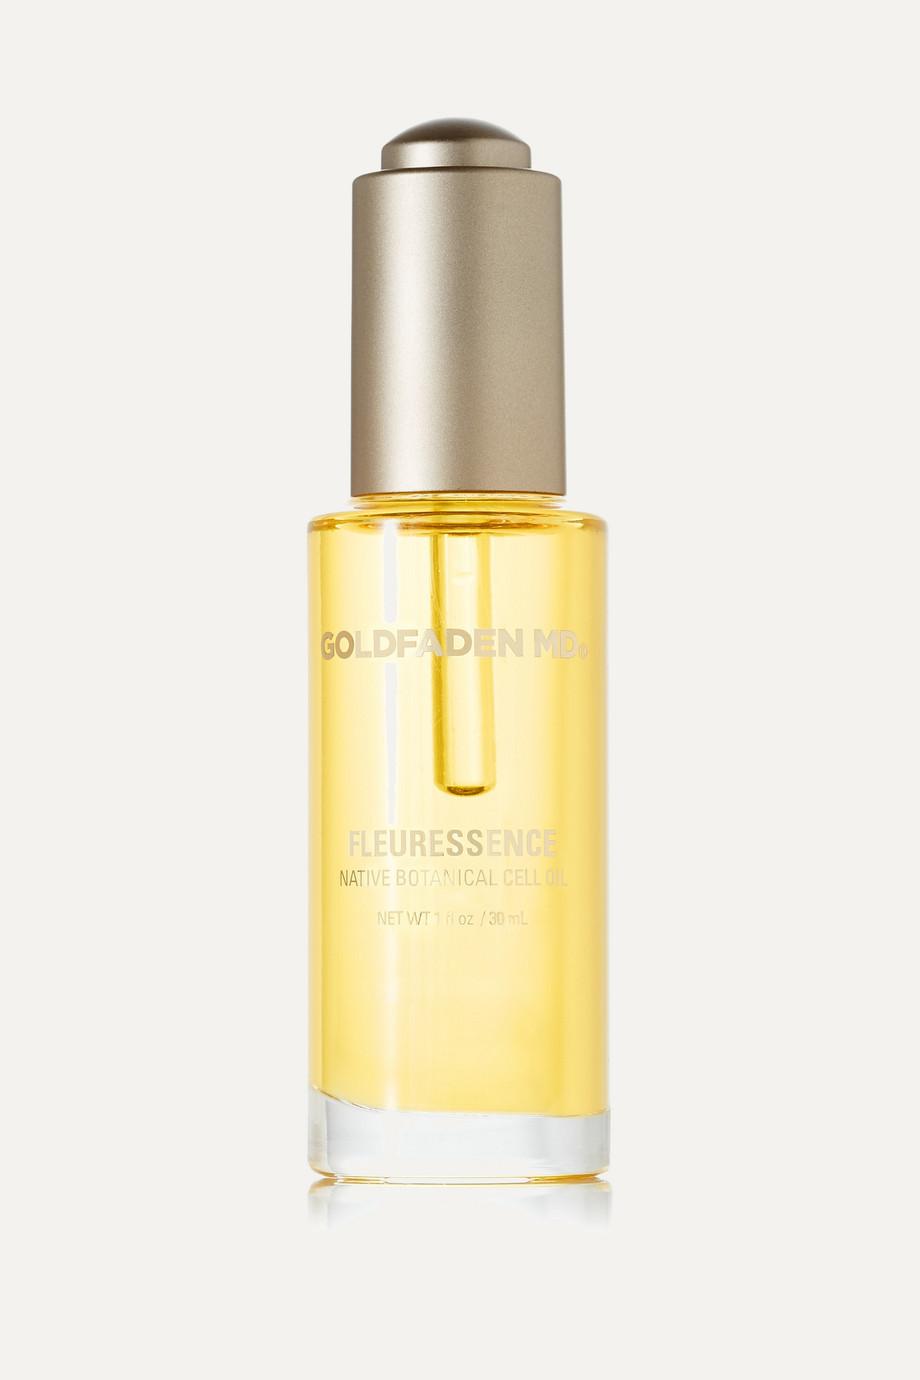 Fleuressence Native Botanical Cell Oil, 30ml, by Goldfaden MD